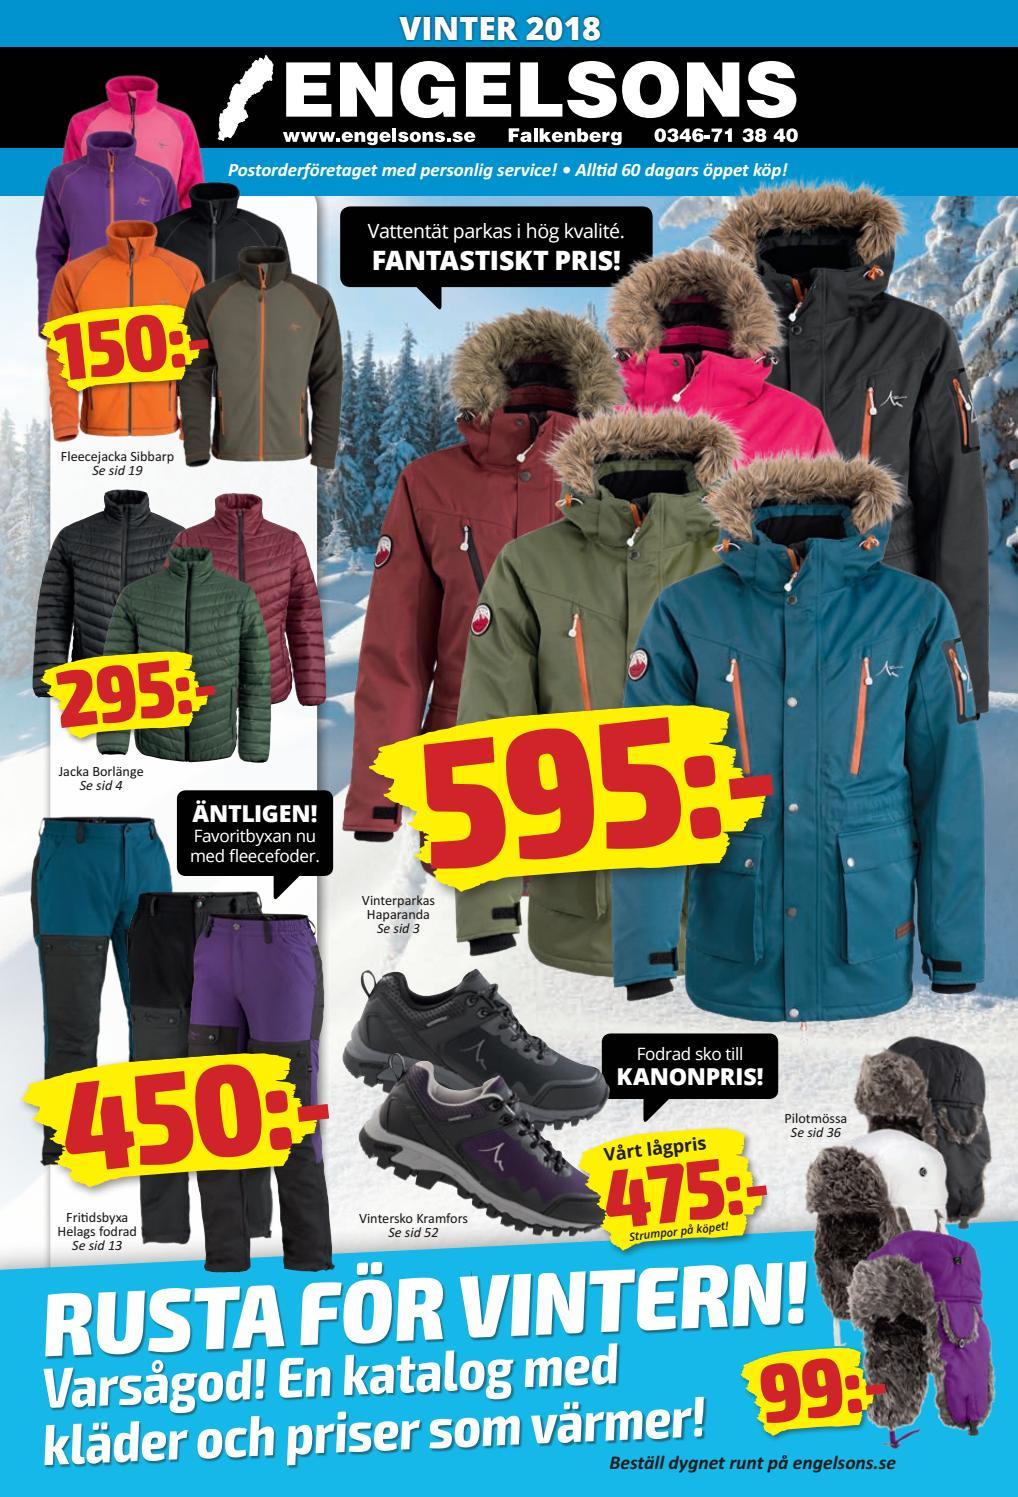 Engelsons vinterkatalog 2018 by Engelsons Postorder AB - issuu a1872a482784b